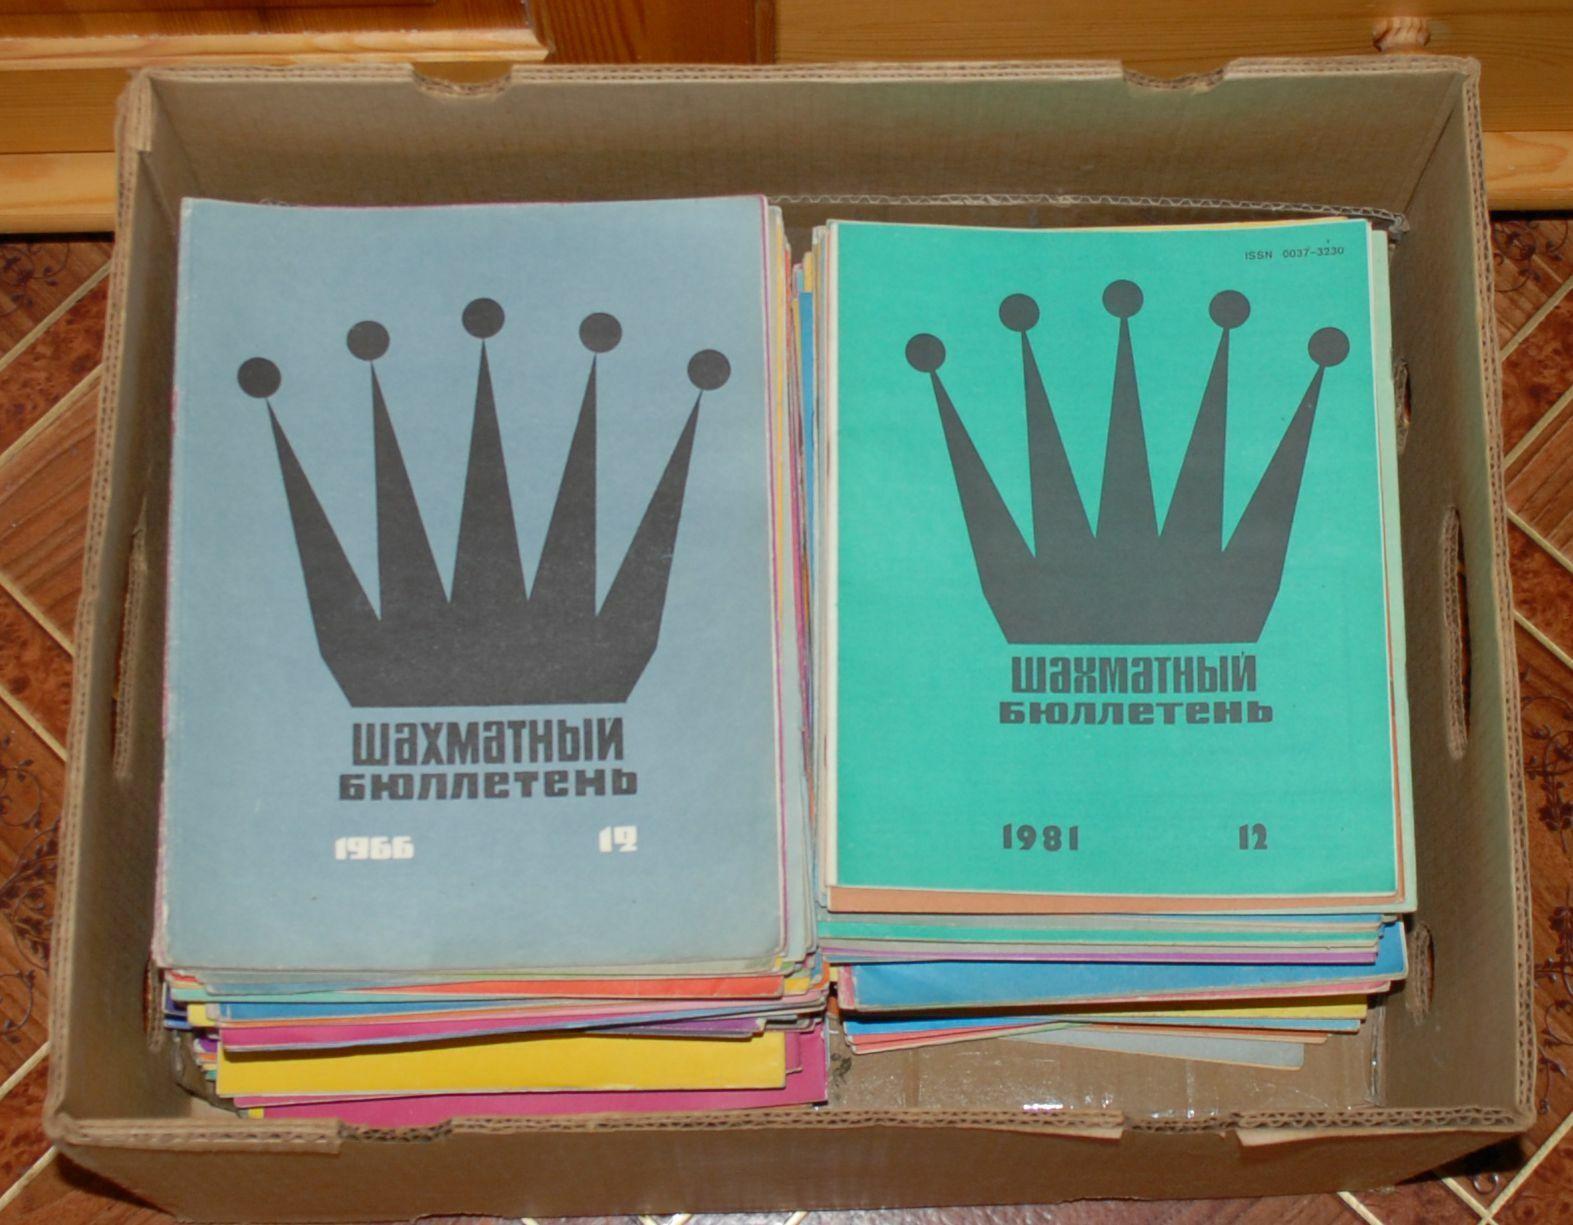 SOVIET CHESS MAGAZINES x168 14Kg+  ШАХМАТНЫЙ БЮЛЛЕТЕНЬ  BULK LOT 1967-1990 read